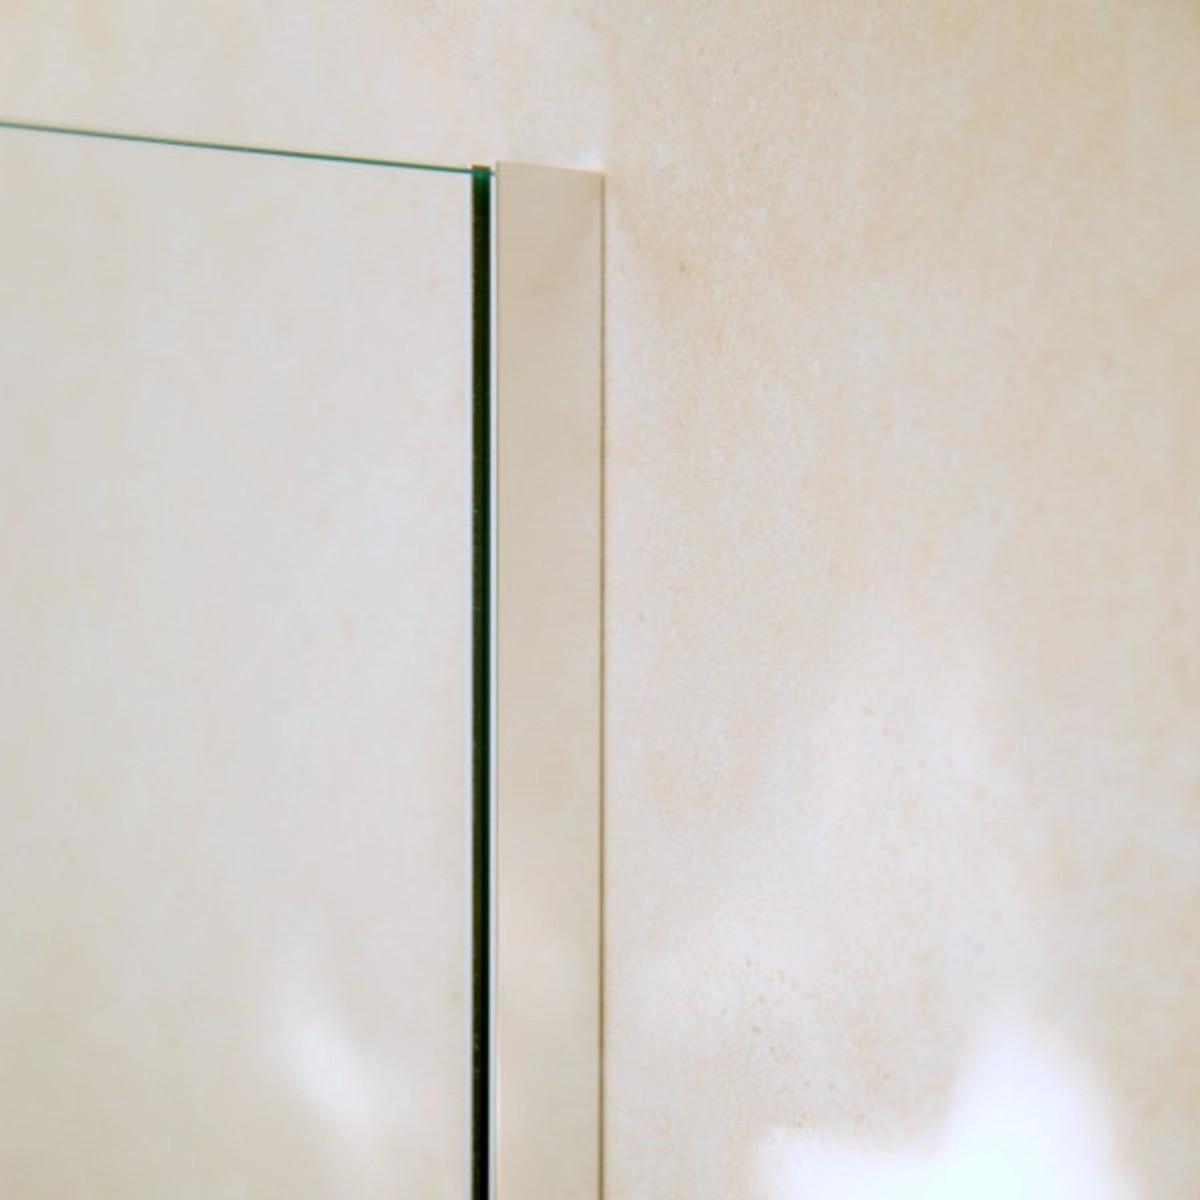 U-Profil Aluminium (Wandbefestigung), 2010 x 20 x 12 x 20 x 2mm, Chromoptik